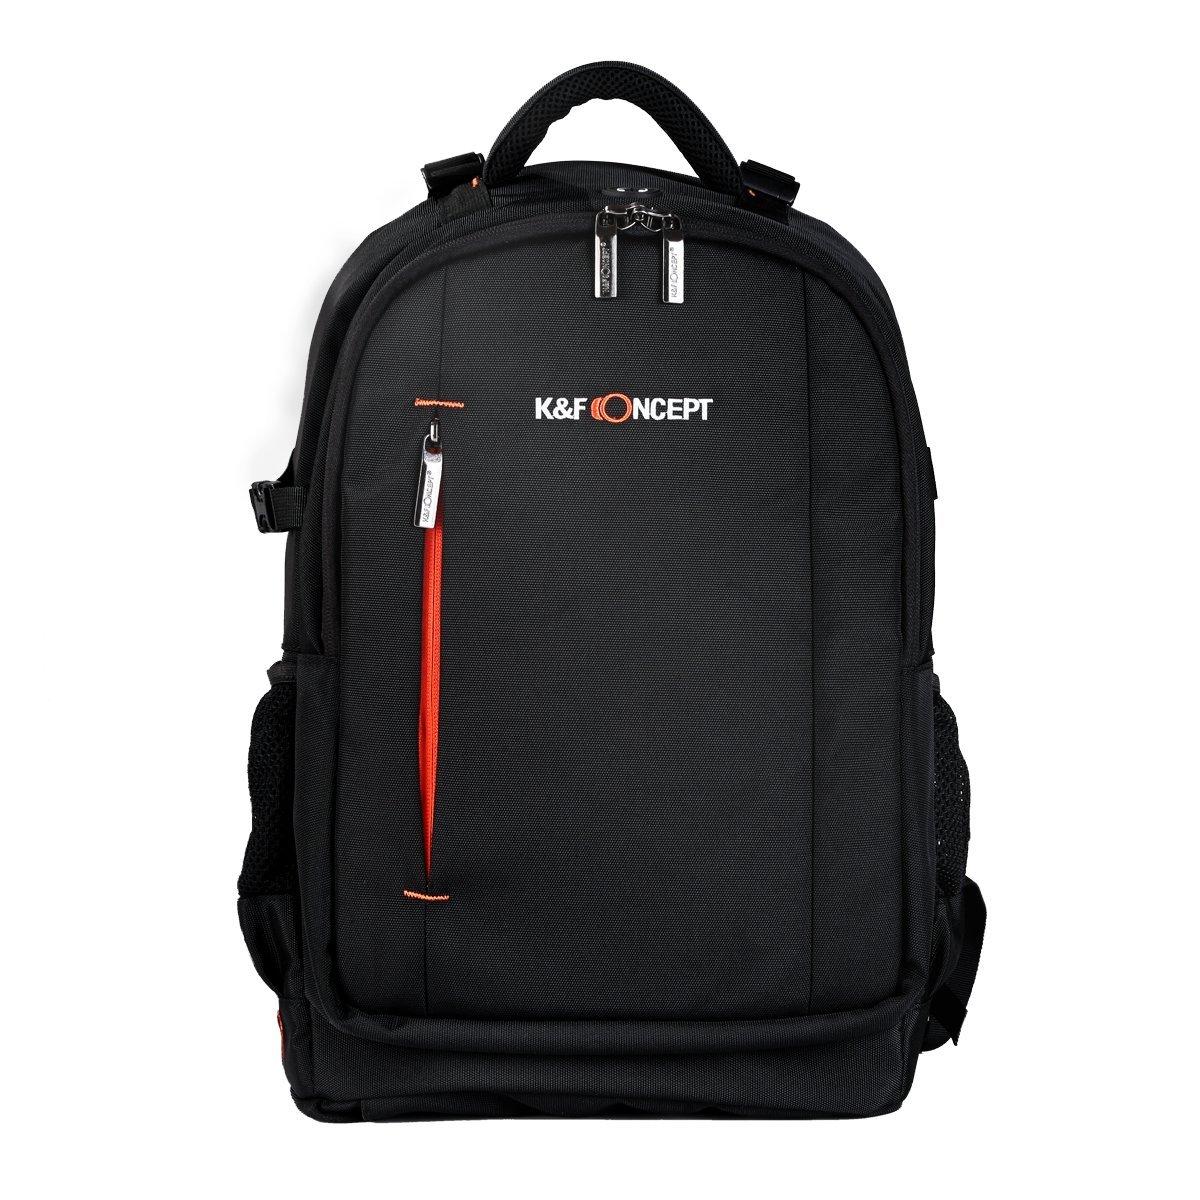 *Rucksack kamera K&F Concept® SLR-Kamerarucksack*